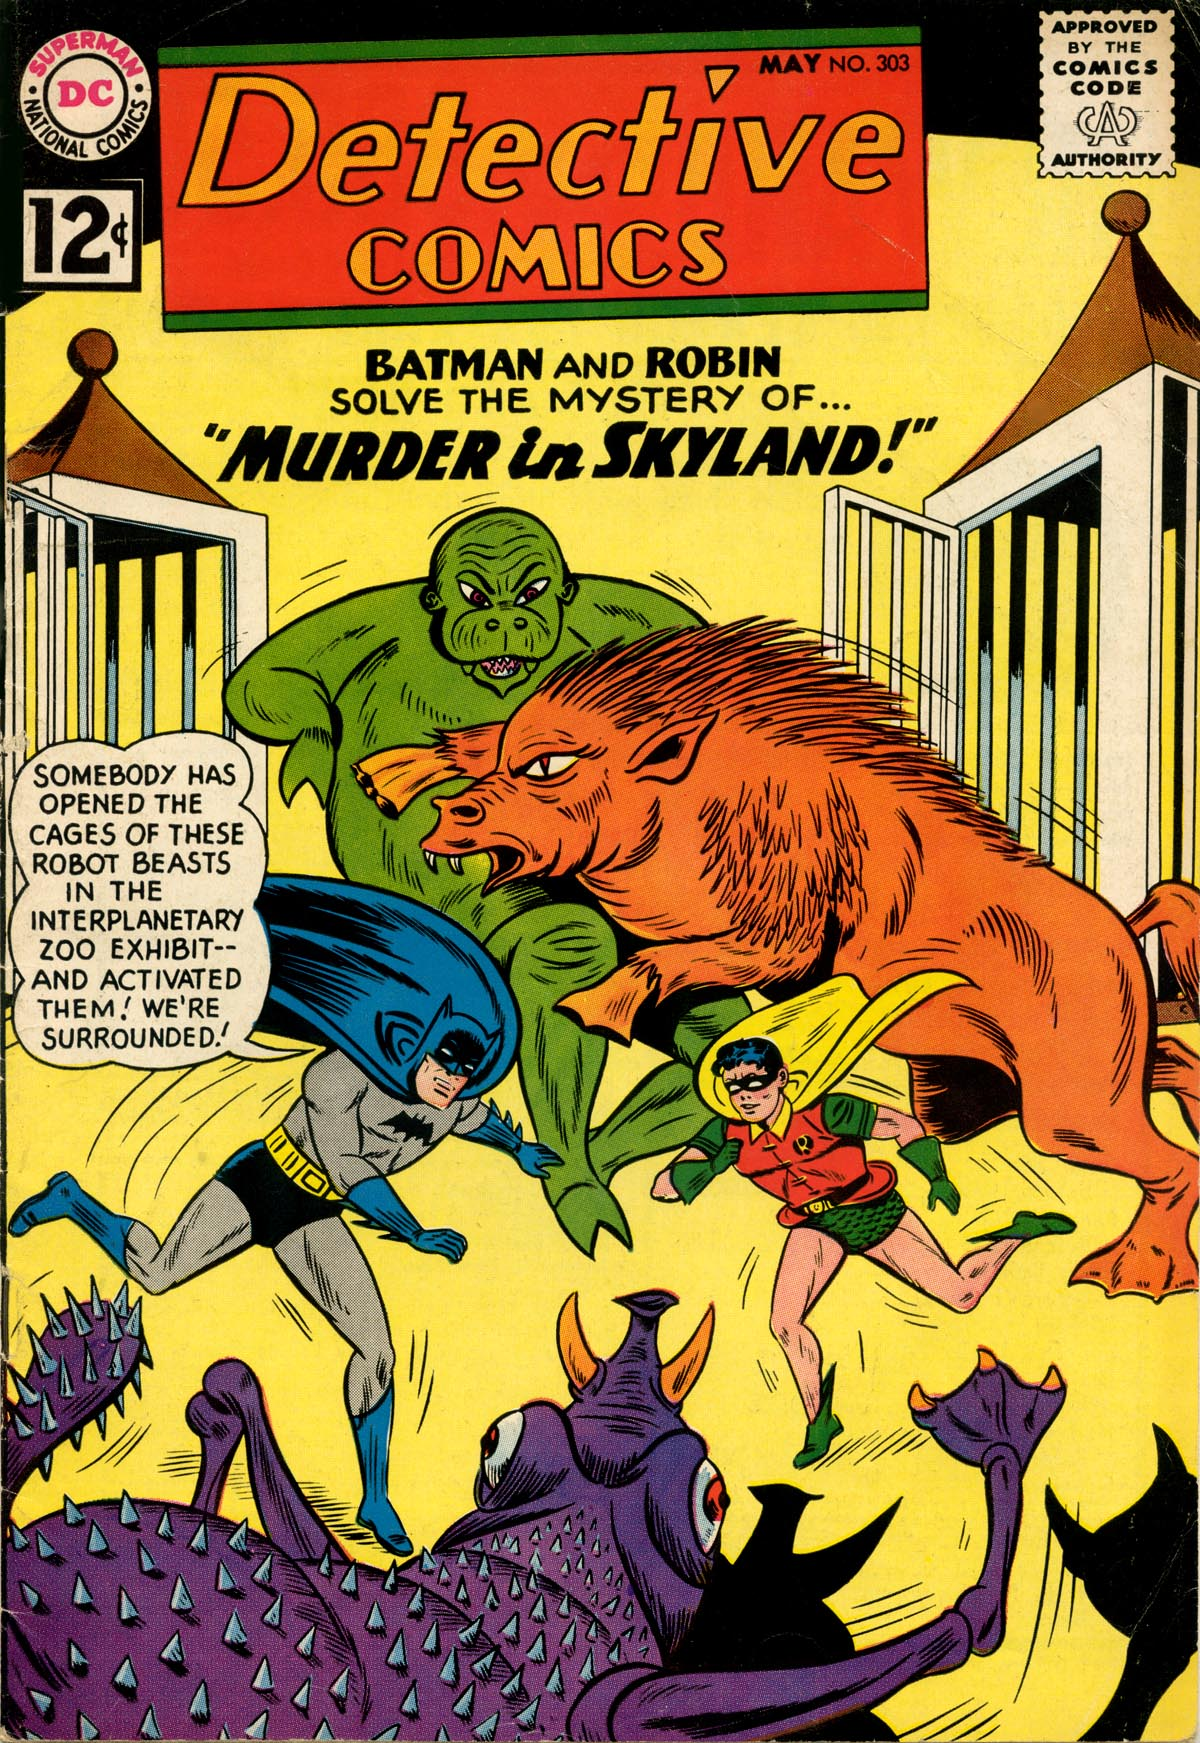 Detective Comics (1937) 303 Page 1